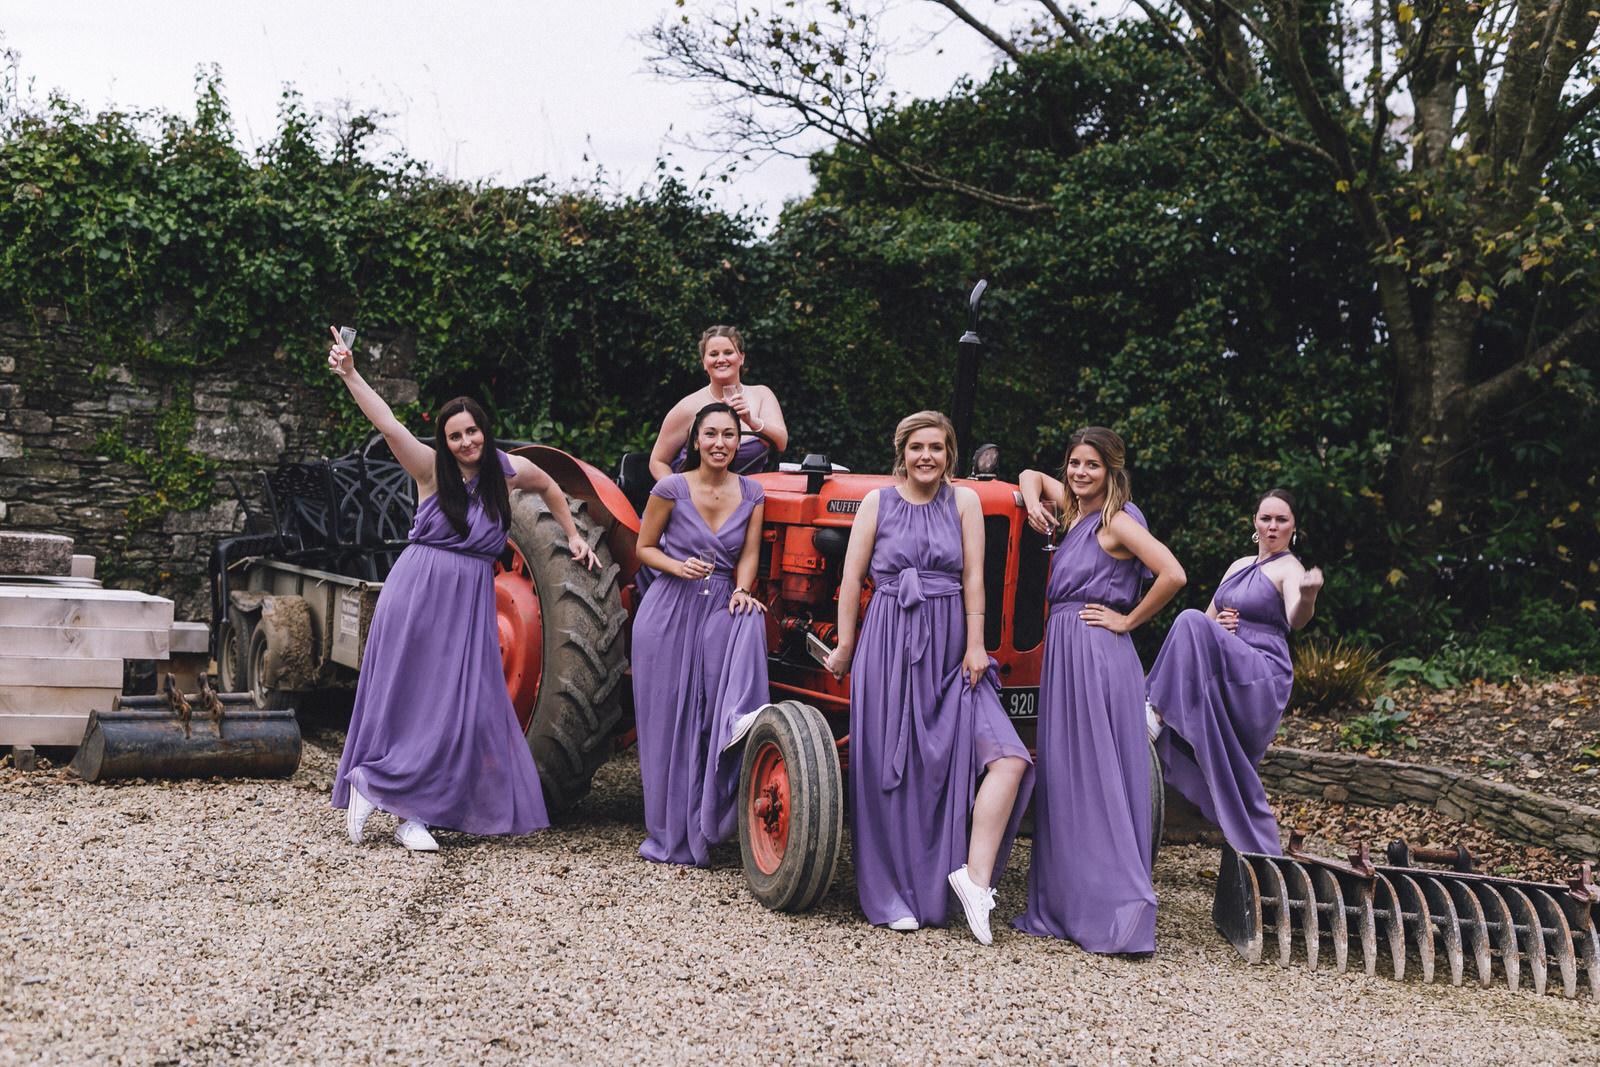 Balybeg-house-ireland-wicklow-wedding-photographer-roger-kenny_greystones099.jpg